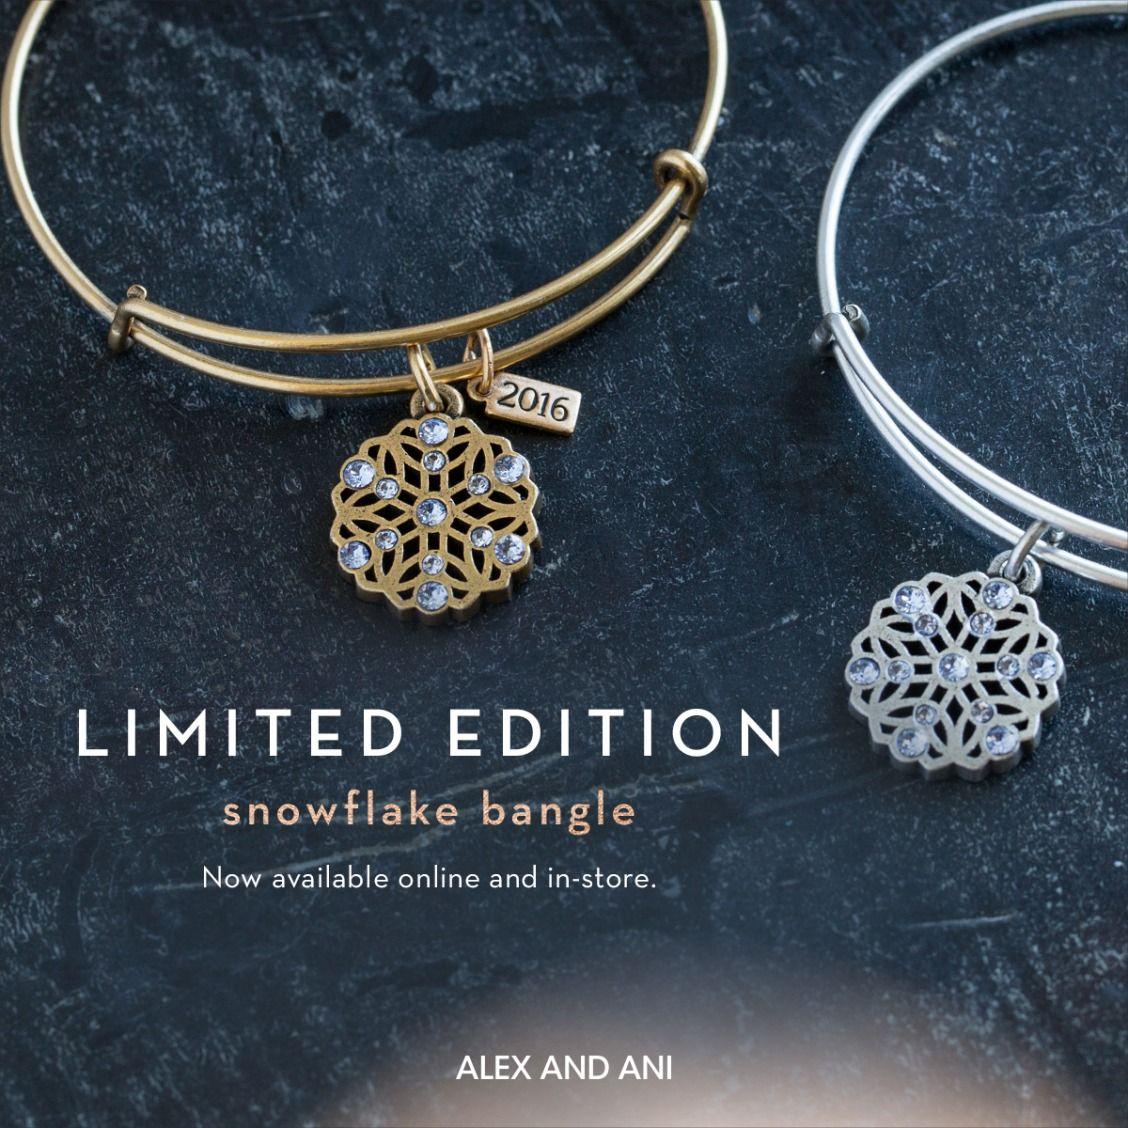 limited edition pandora bracelet 2016